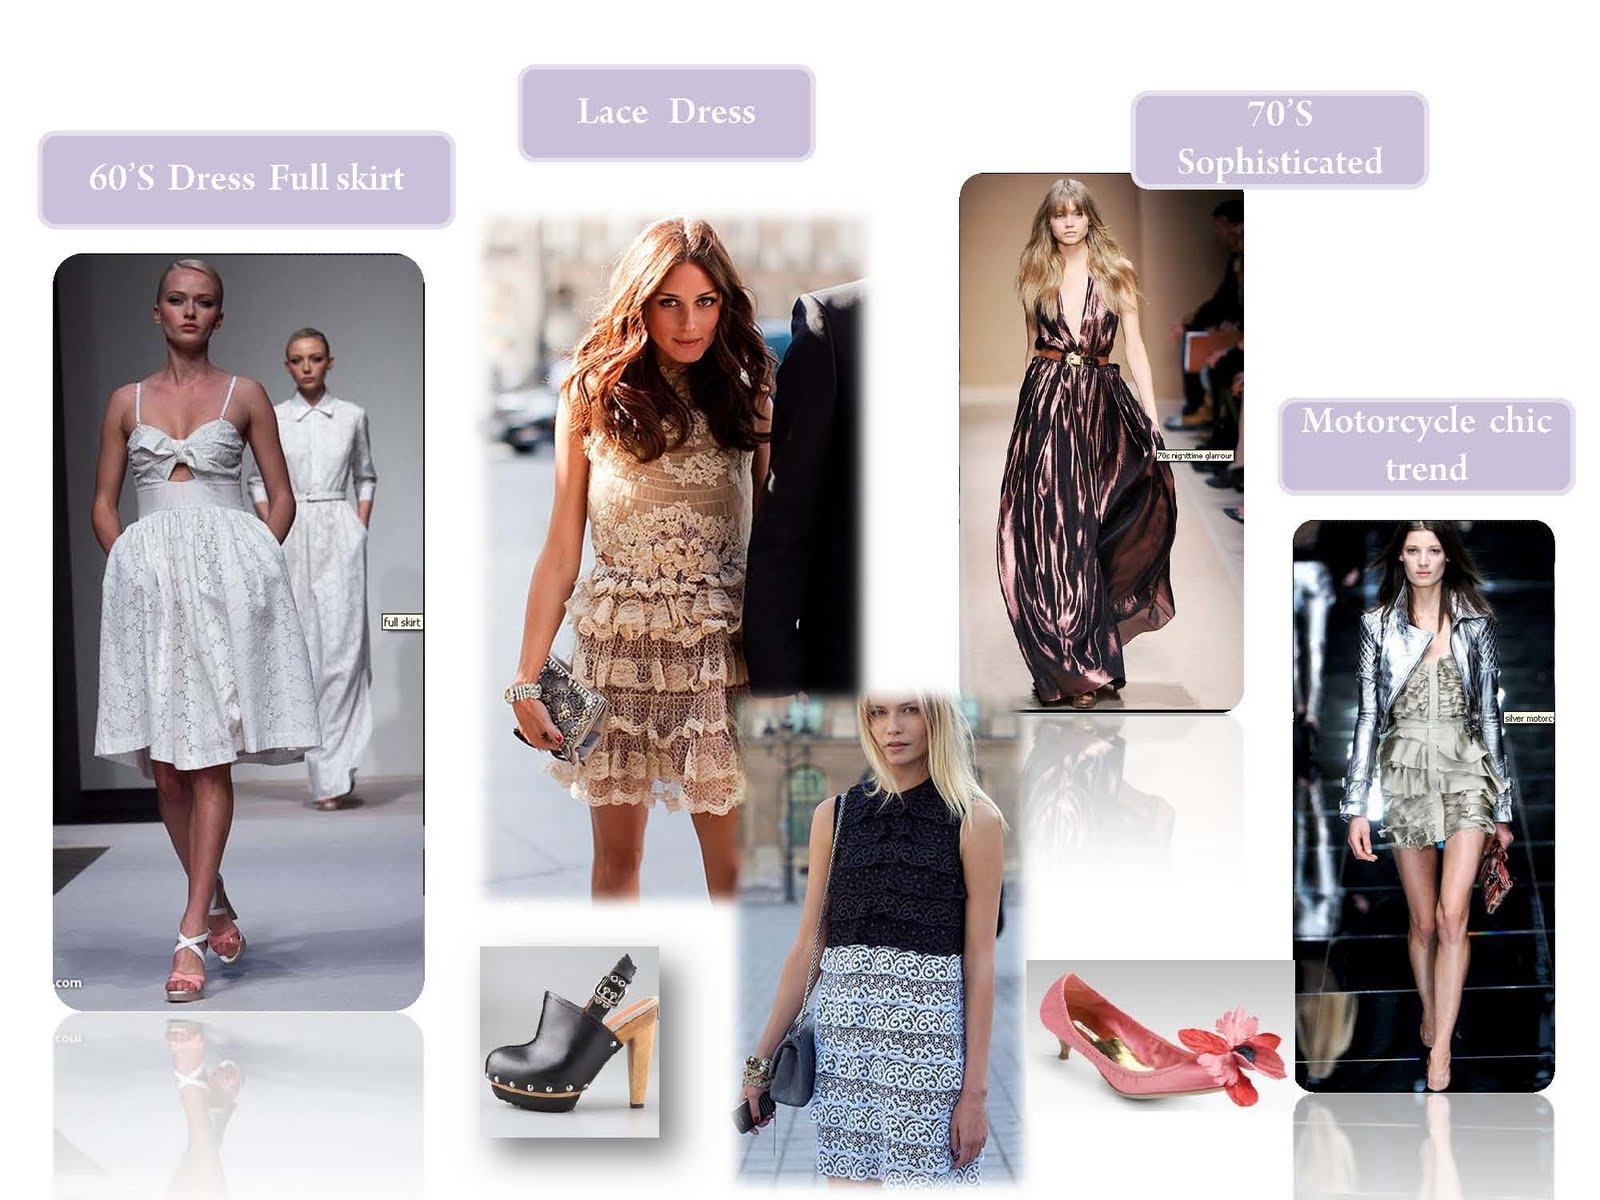 Fashion TV | FTV.com | Official Website of FTV Fashion Channel